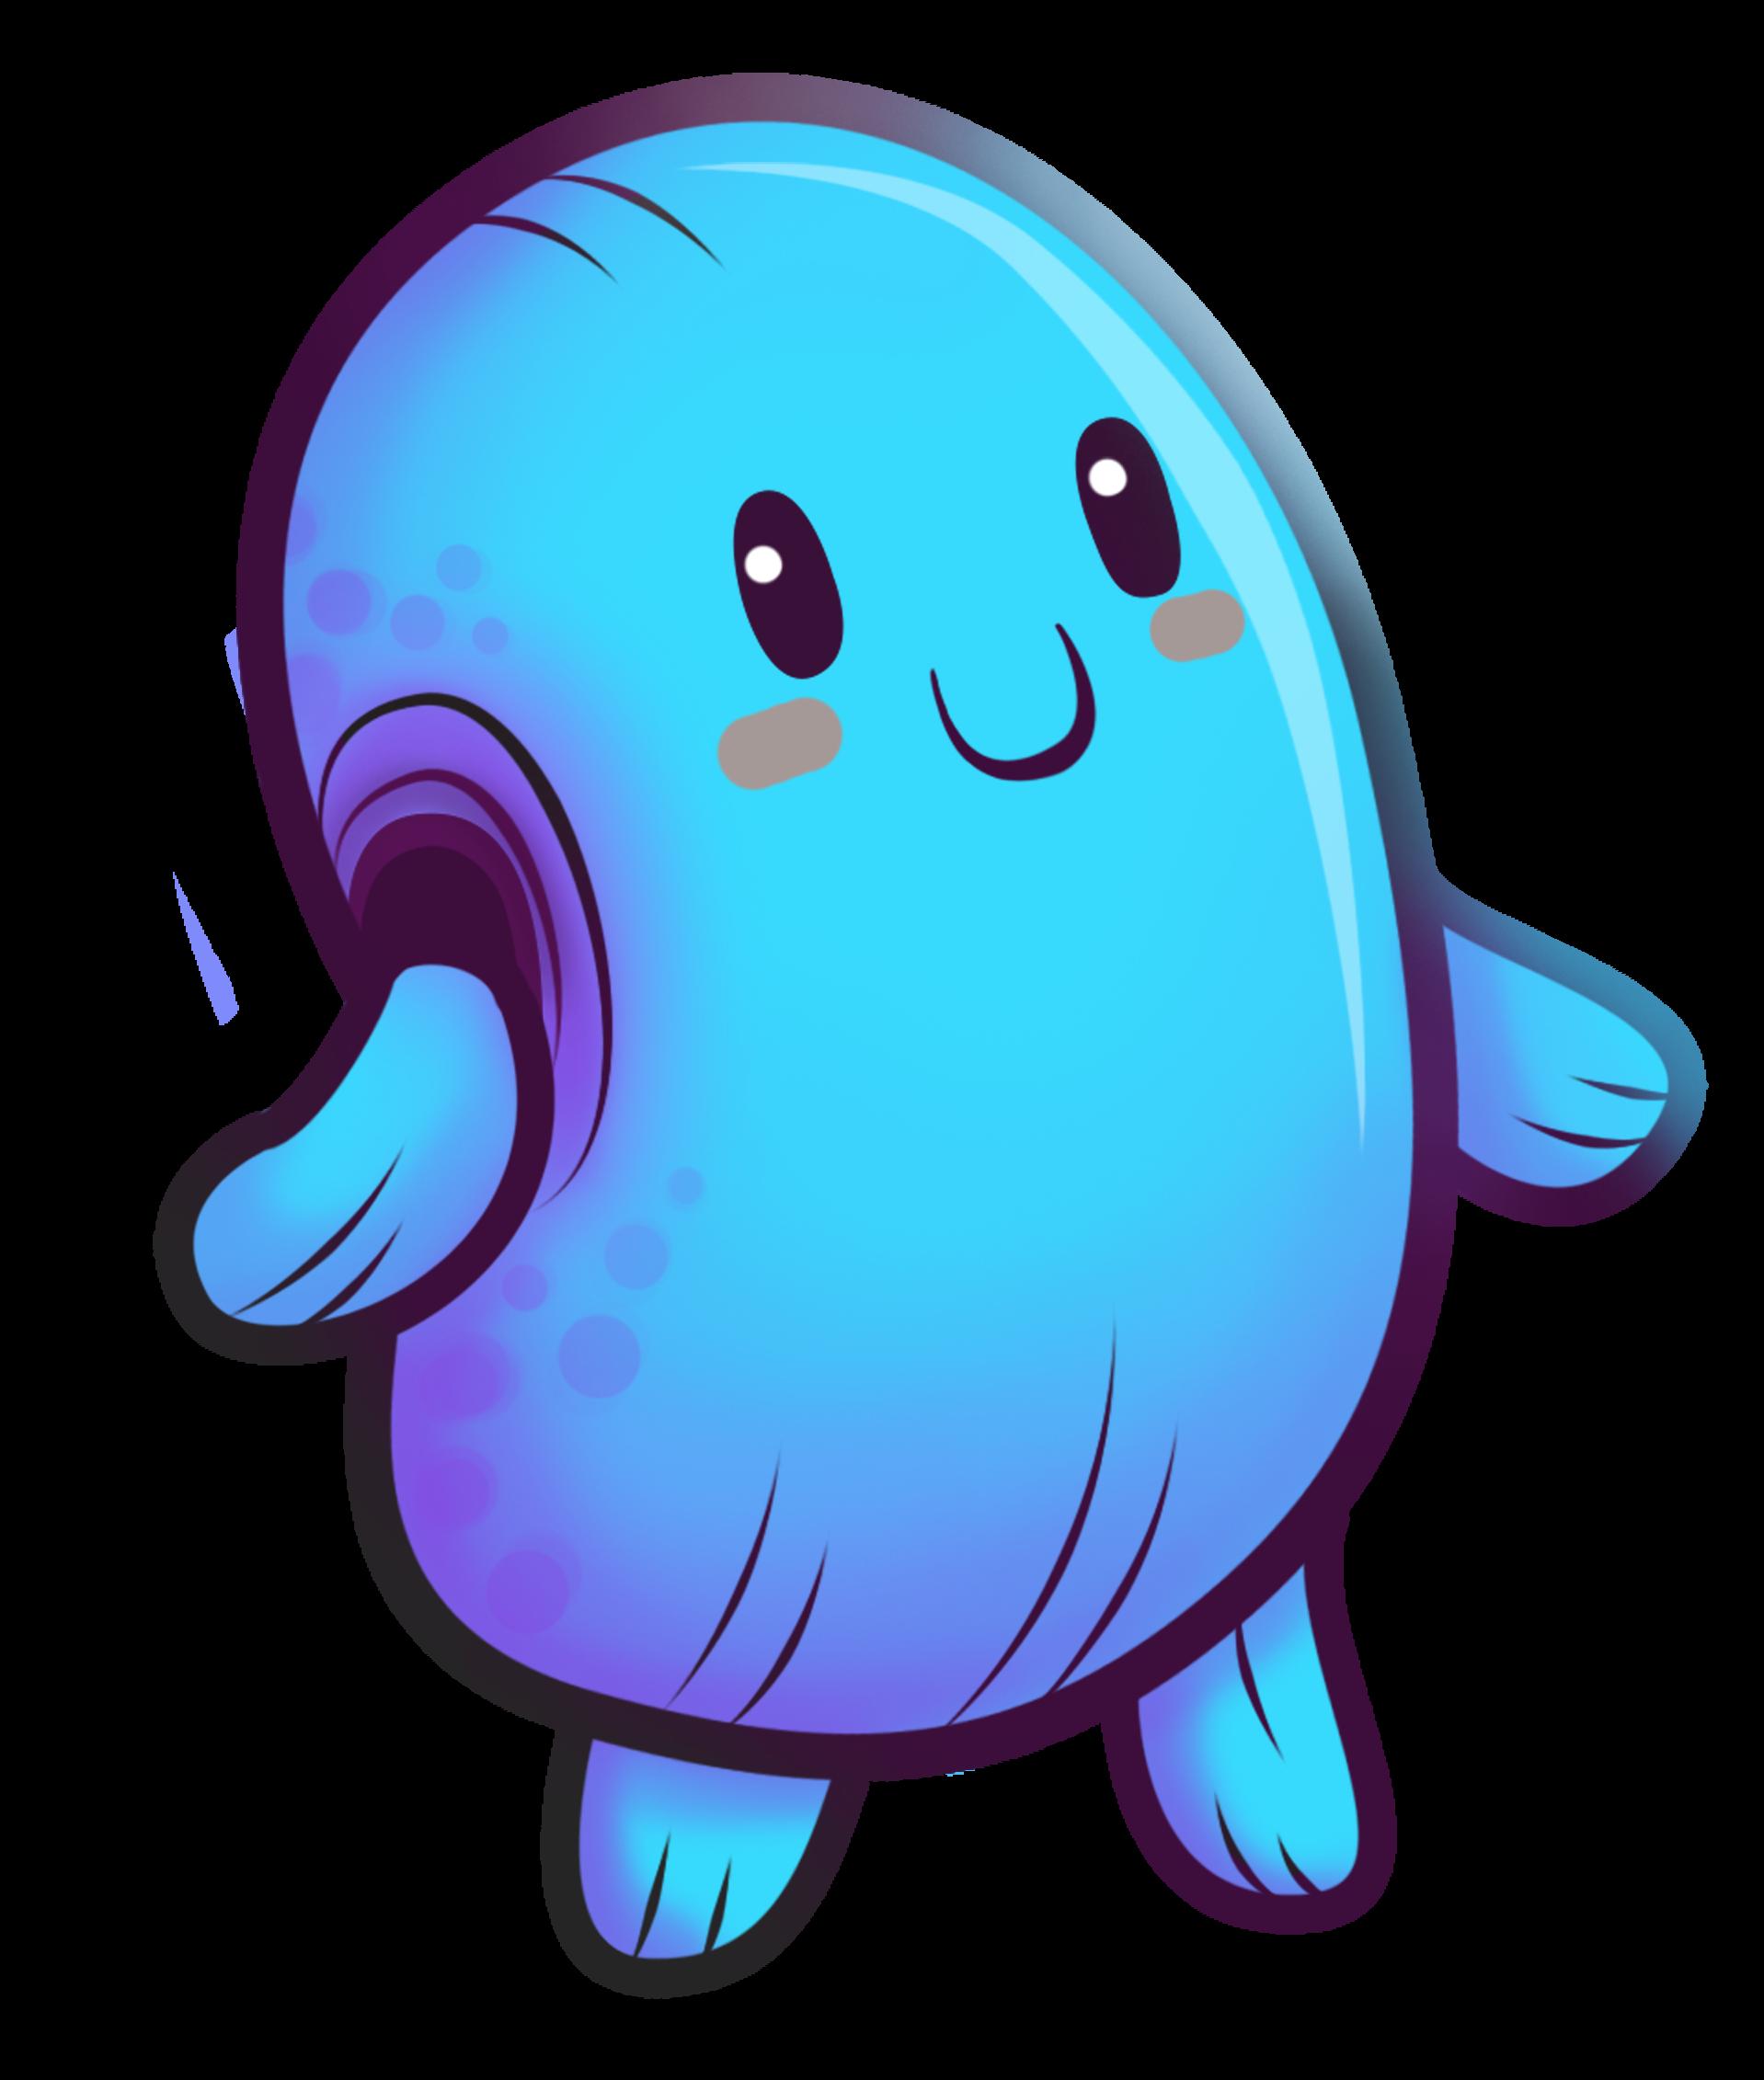 Seedify.fund Mascot Contest